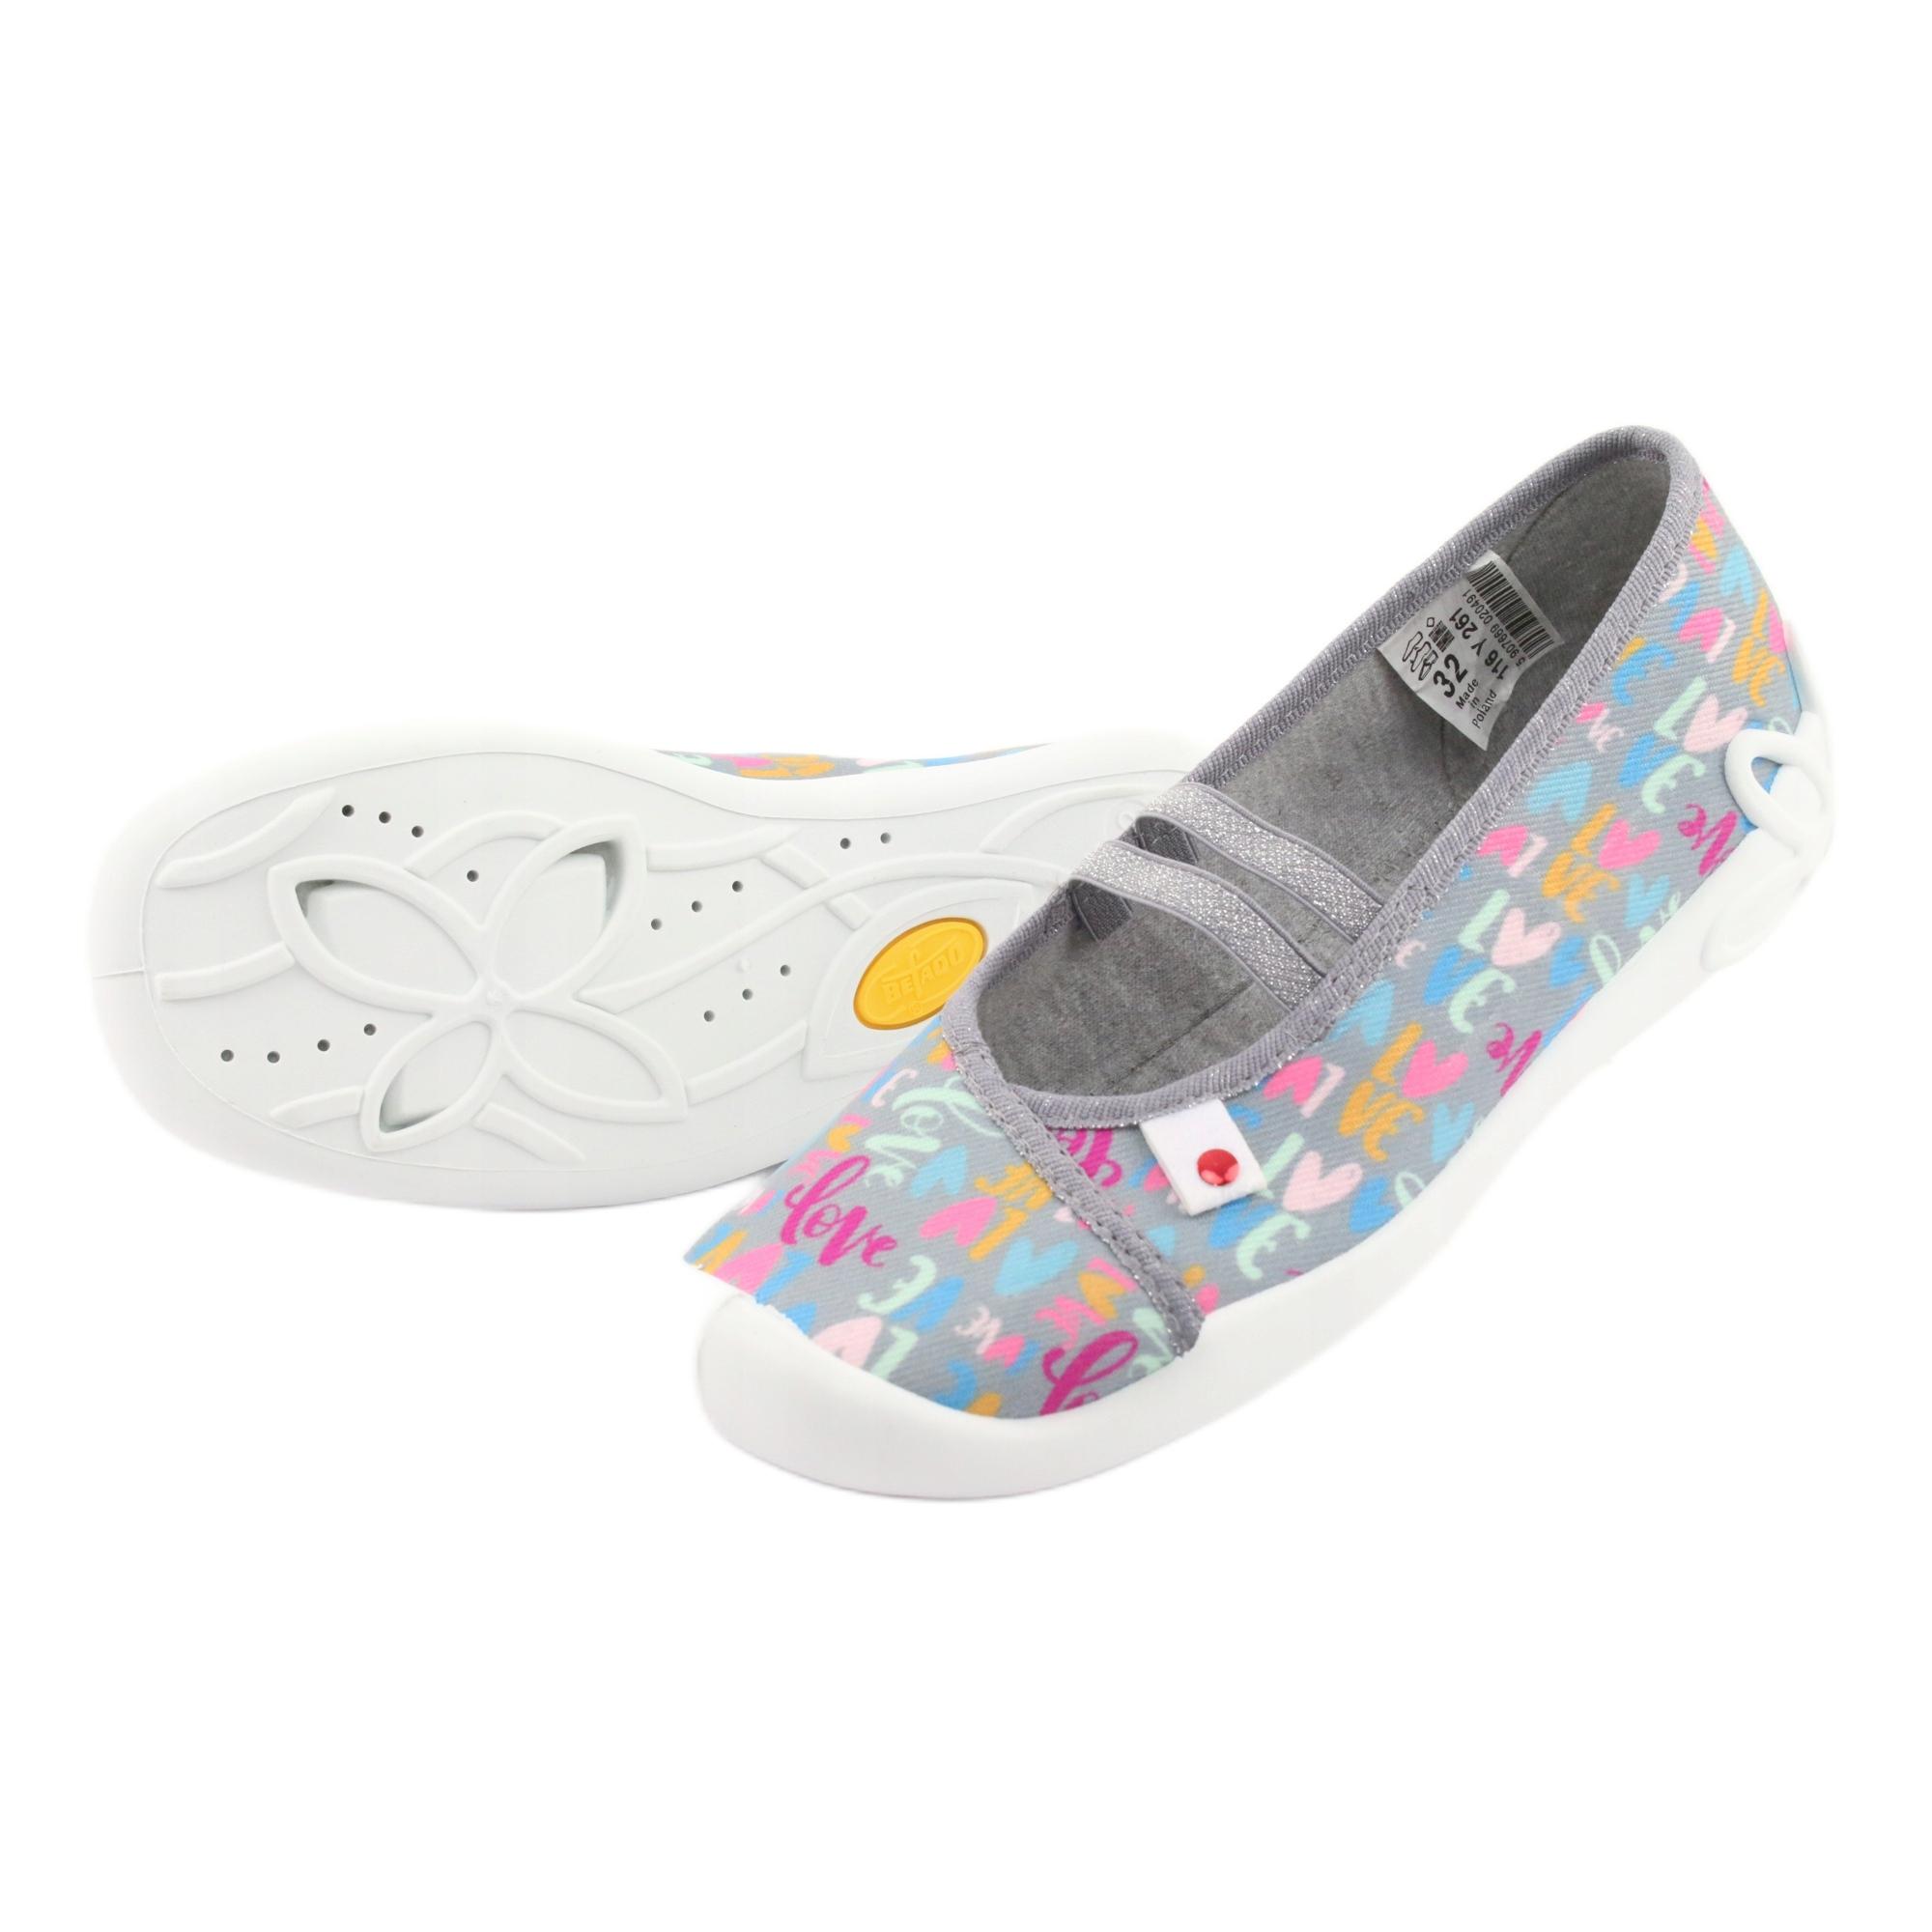 miniatura 6 - Scarpe per bambini Befado 116Y261 blu rosa grigio verde giallo